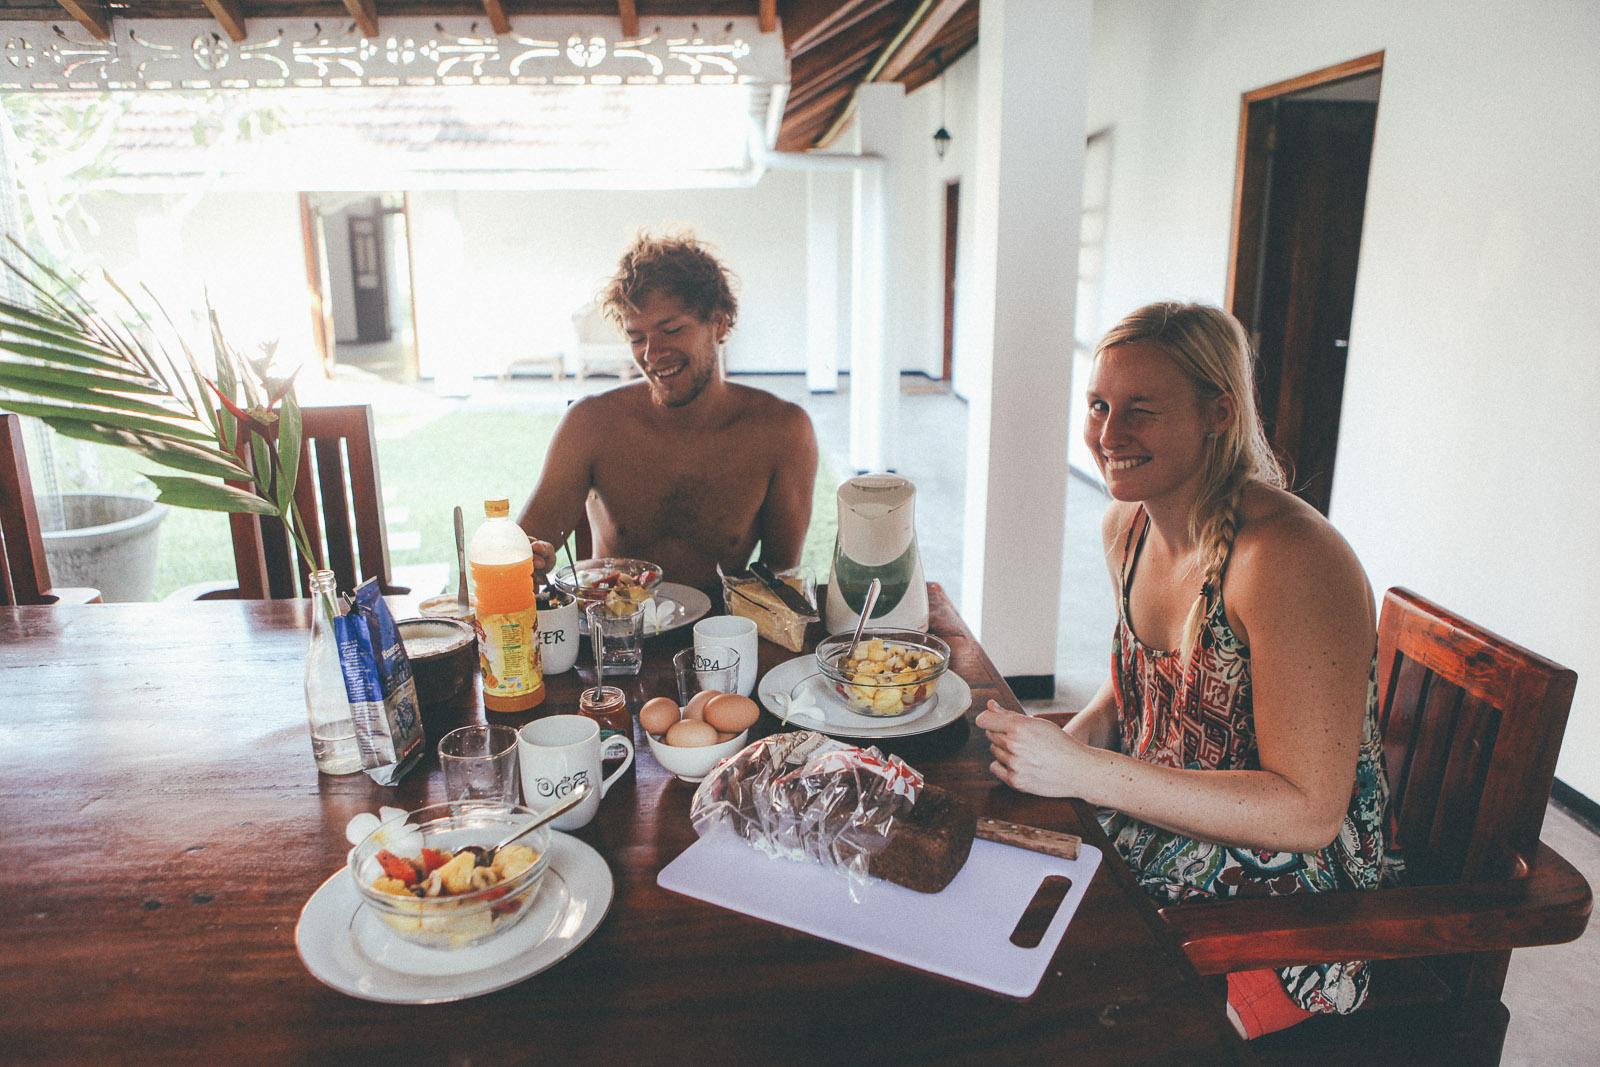 Sri Lanka-Hikkaduwa-Midigama-Aragum Bay-Sunshinestories-surf-travel-blog-IMG_6398